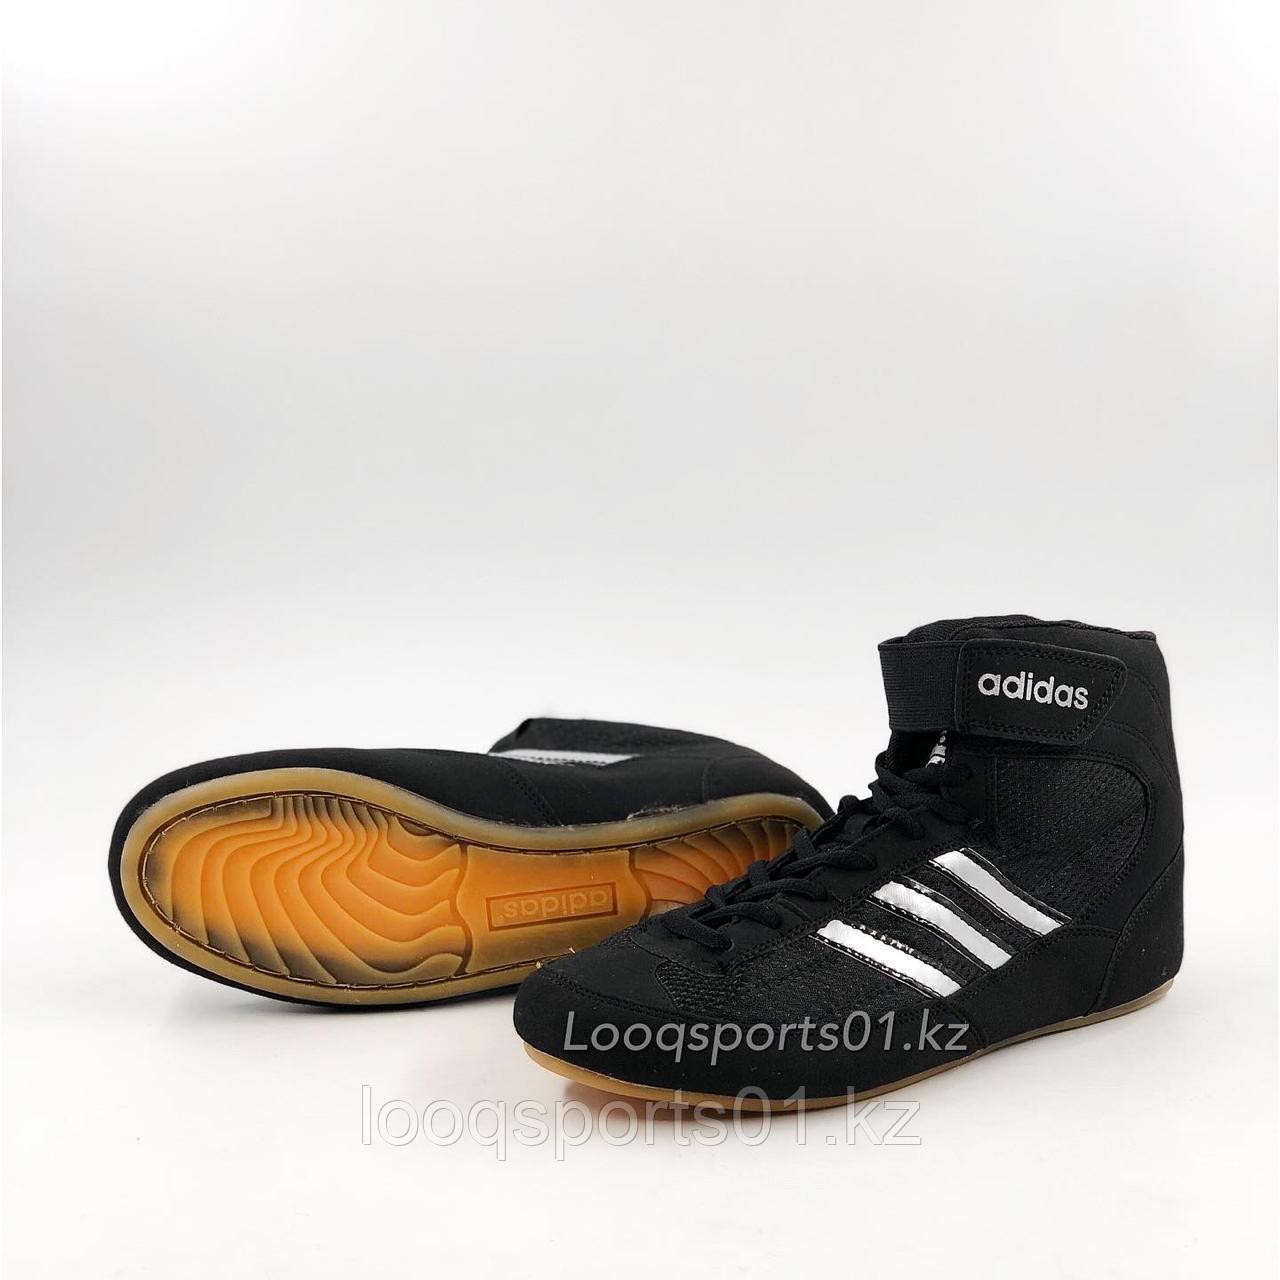 Борцовки Adidas (обувь для борьба)